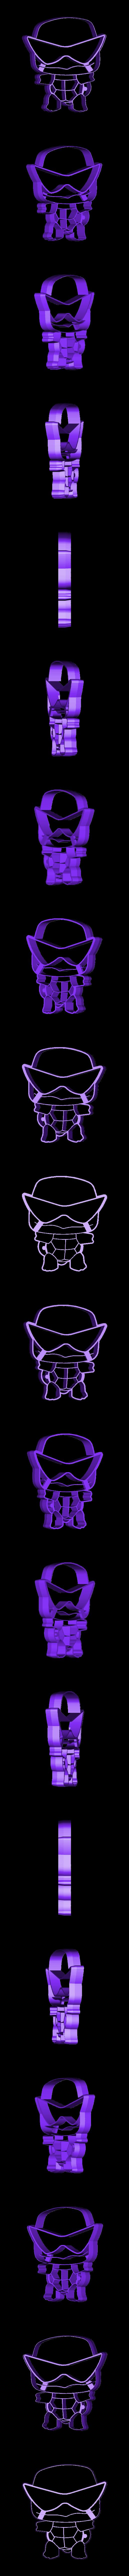 3D-01062 - CHIBI SQUIRTTLE COOKIE CUTTER-2.stl Descargar archivo STL Ardilla Chibi • Plan para la impresión en 3D, 3DPrintersaur